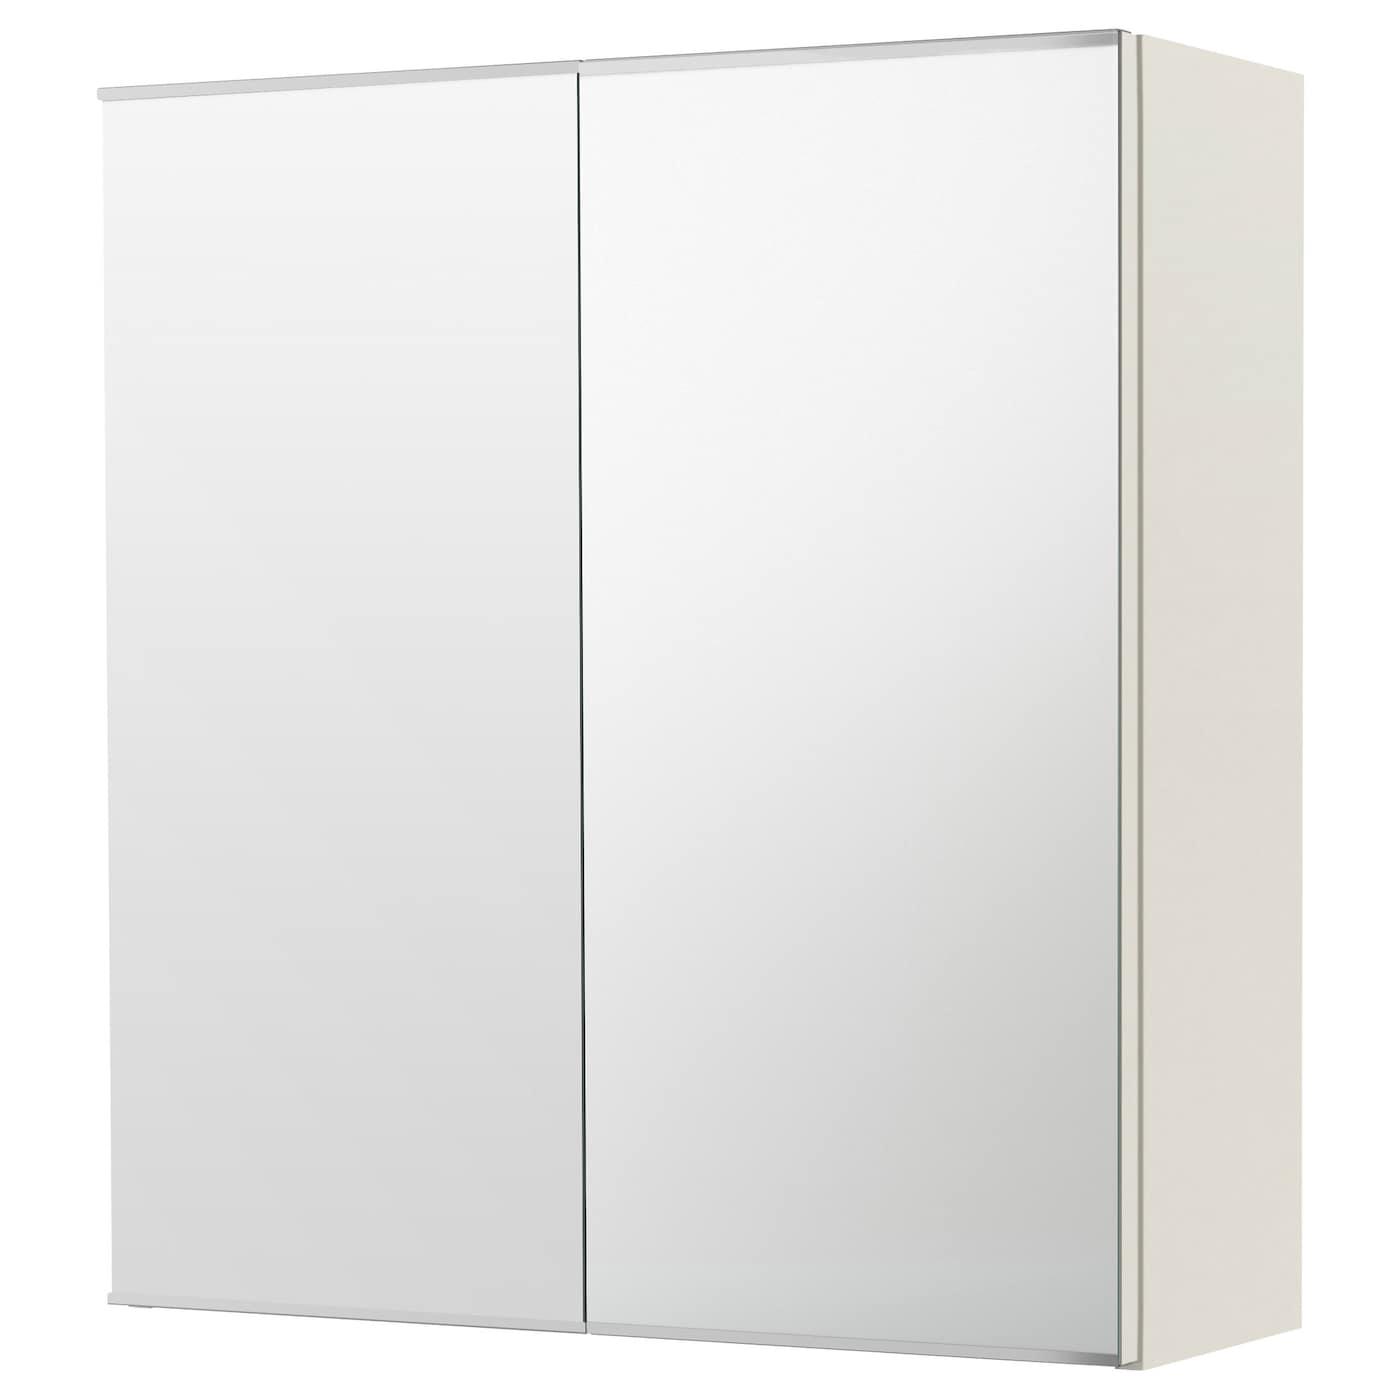 Lillången Armario Espejo 2 Puertas Blanco 60 X 21 X 64 Cm Ikea